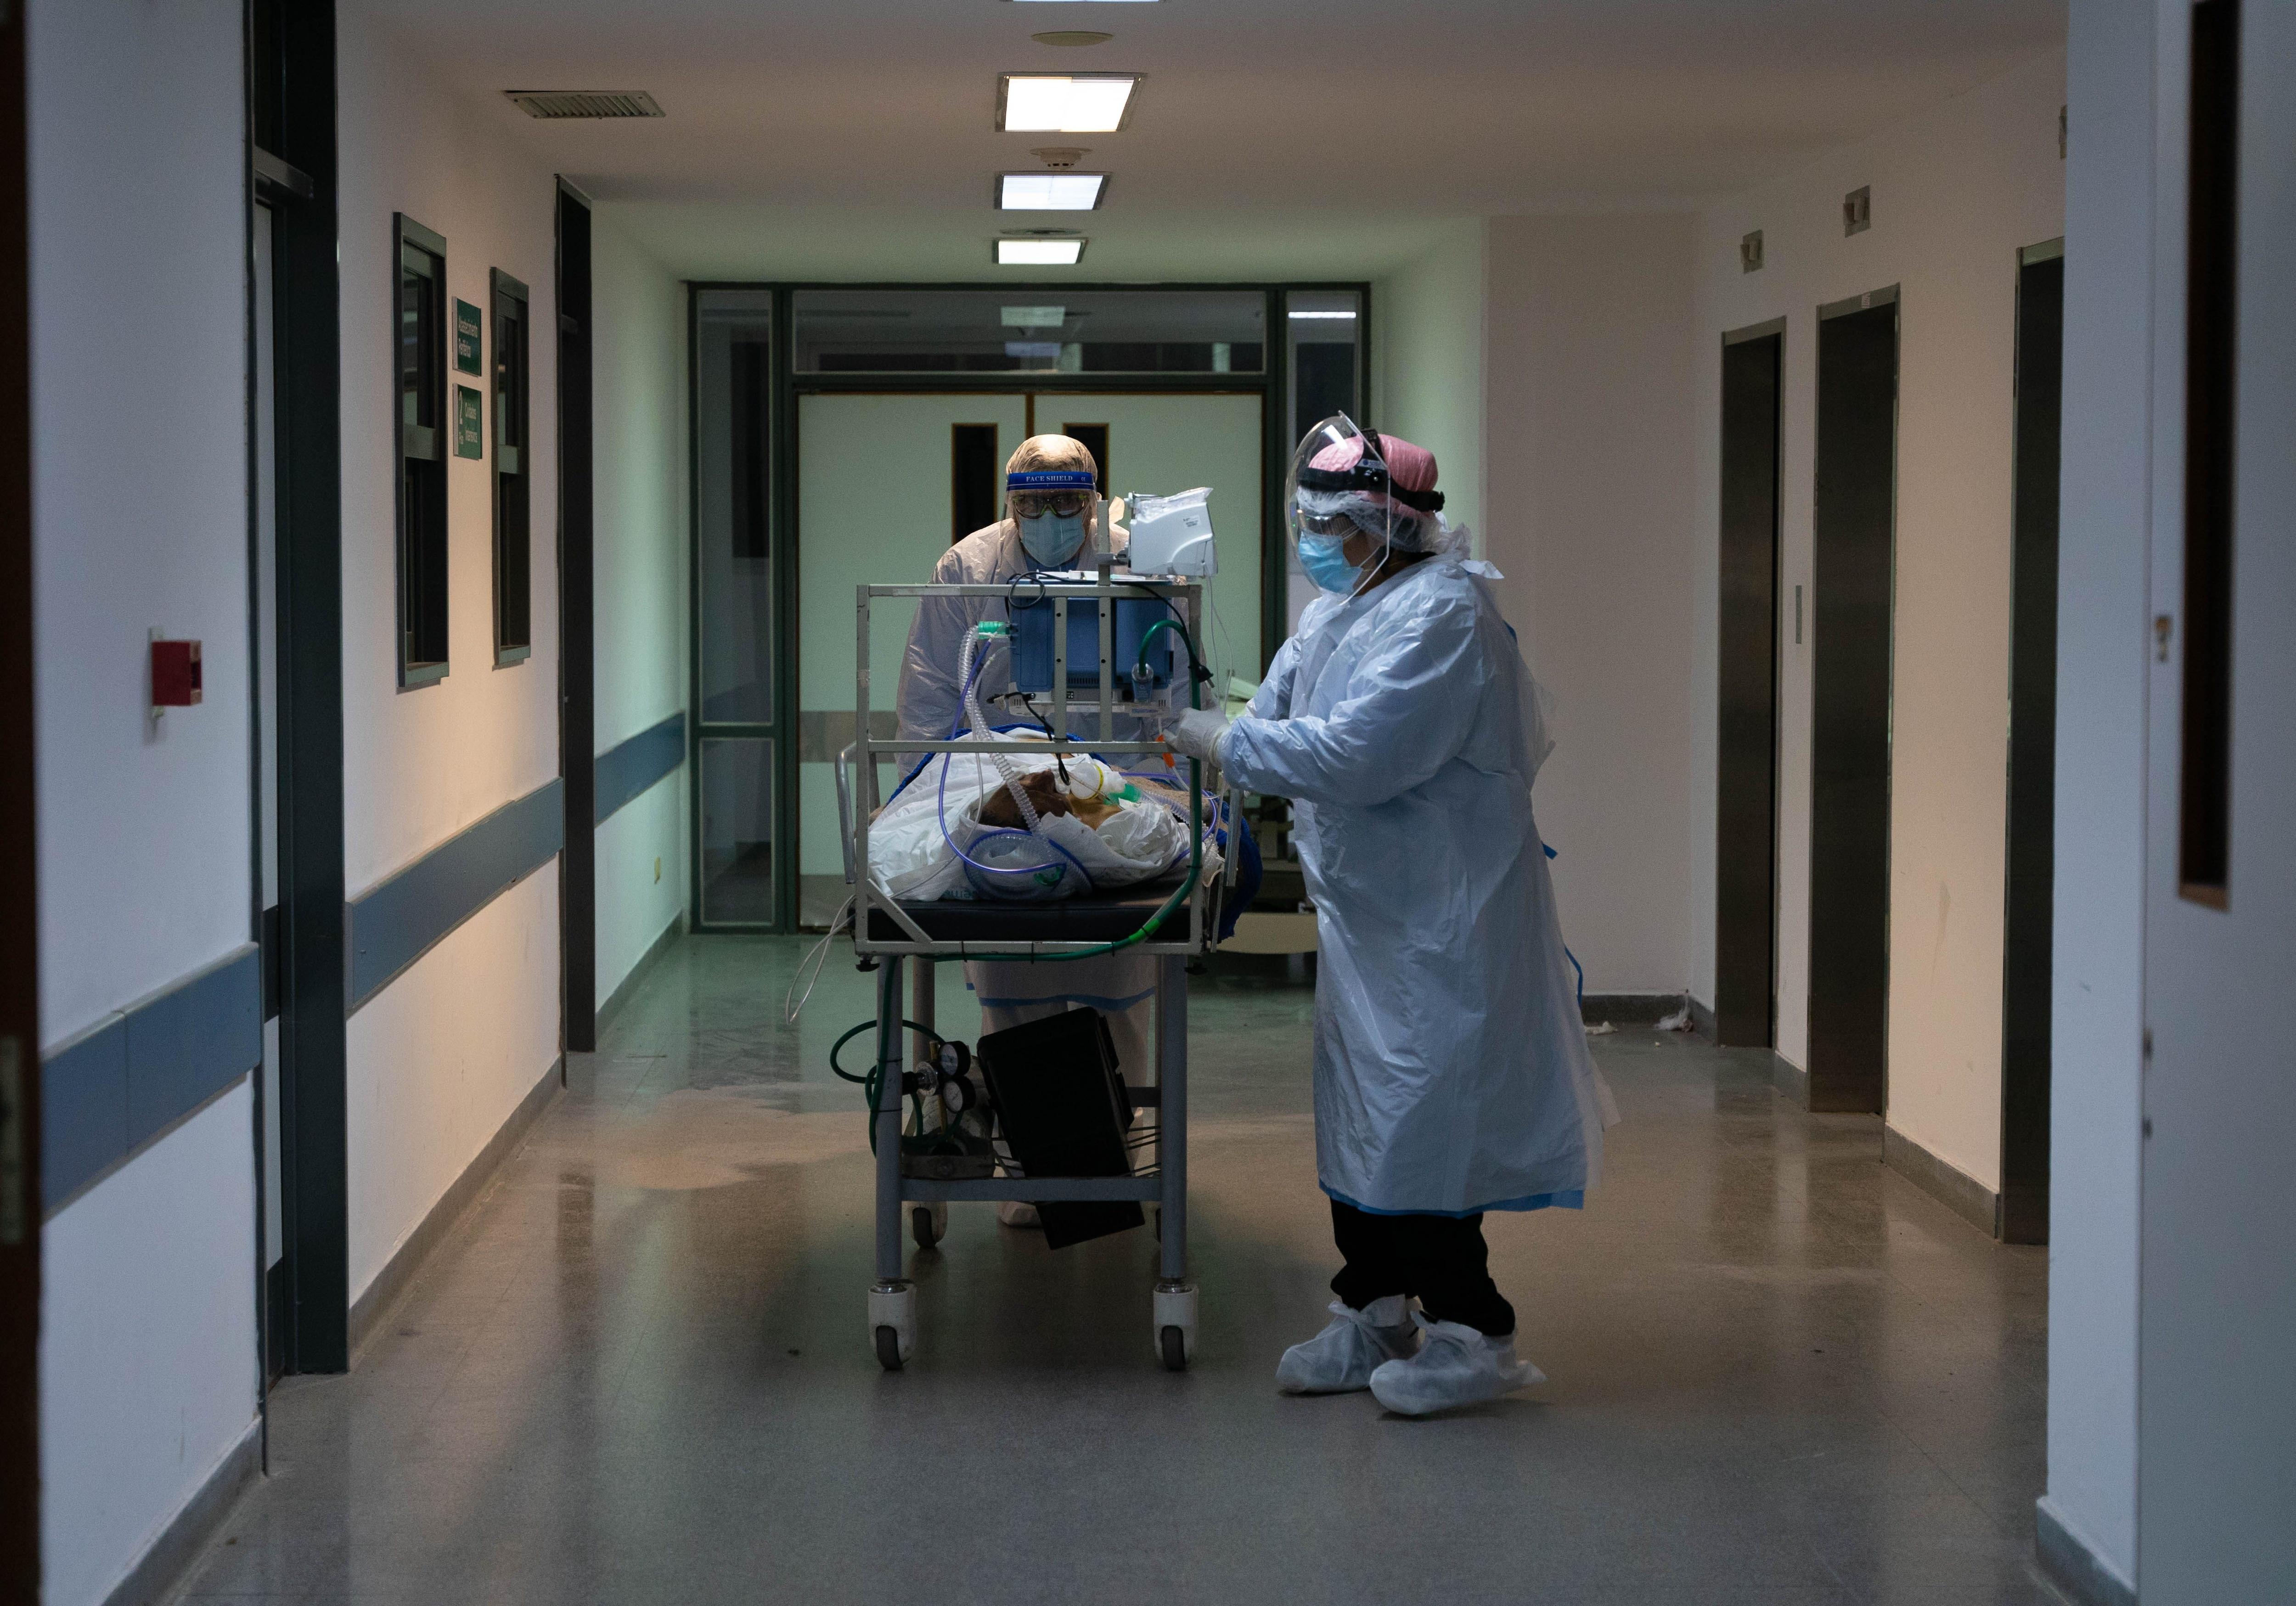 Hospital General San Martin La Plata - Terapia intensiva - UTI - COVID-19 - Coronavirus (Foto: Franco Fafasuli)